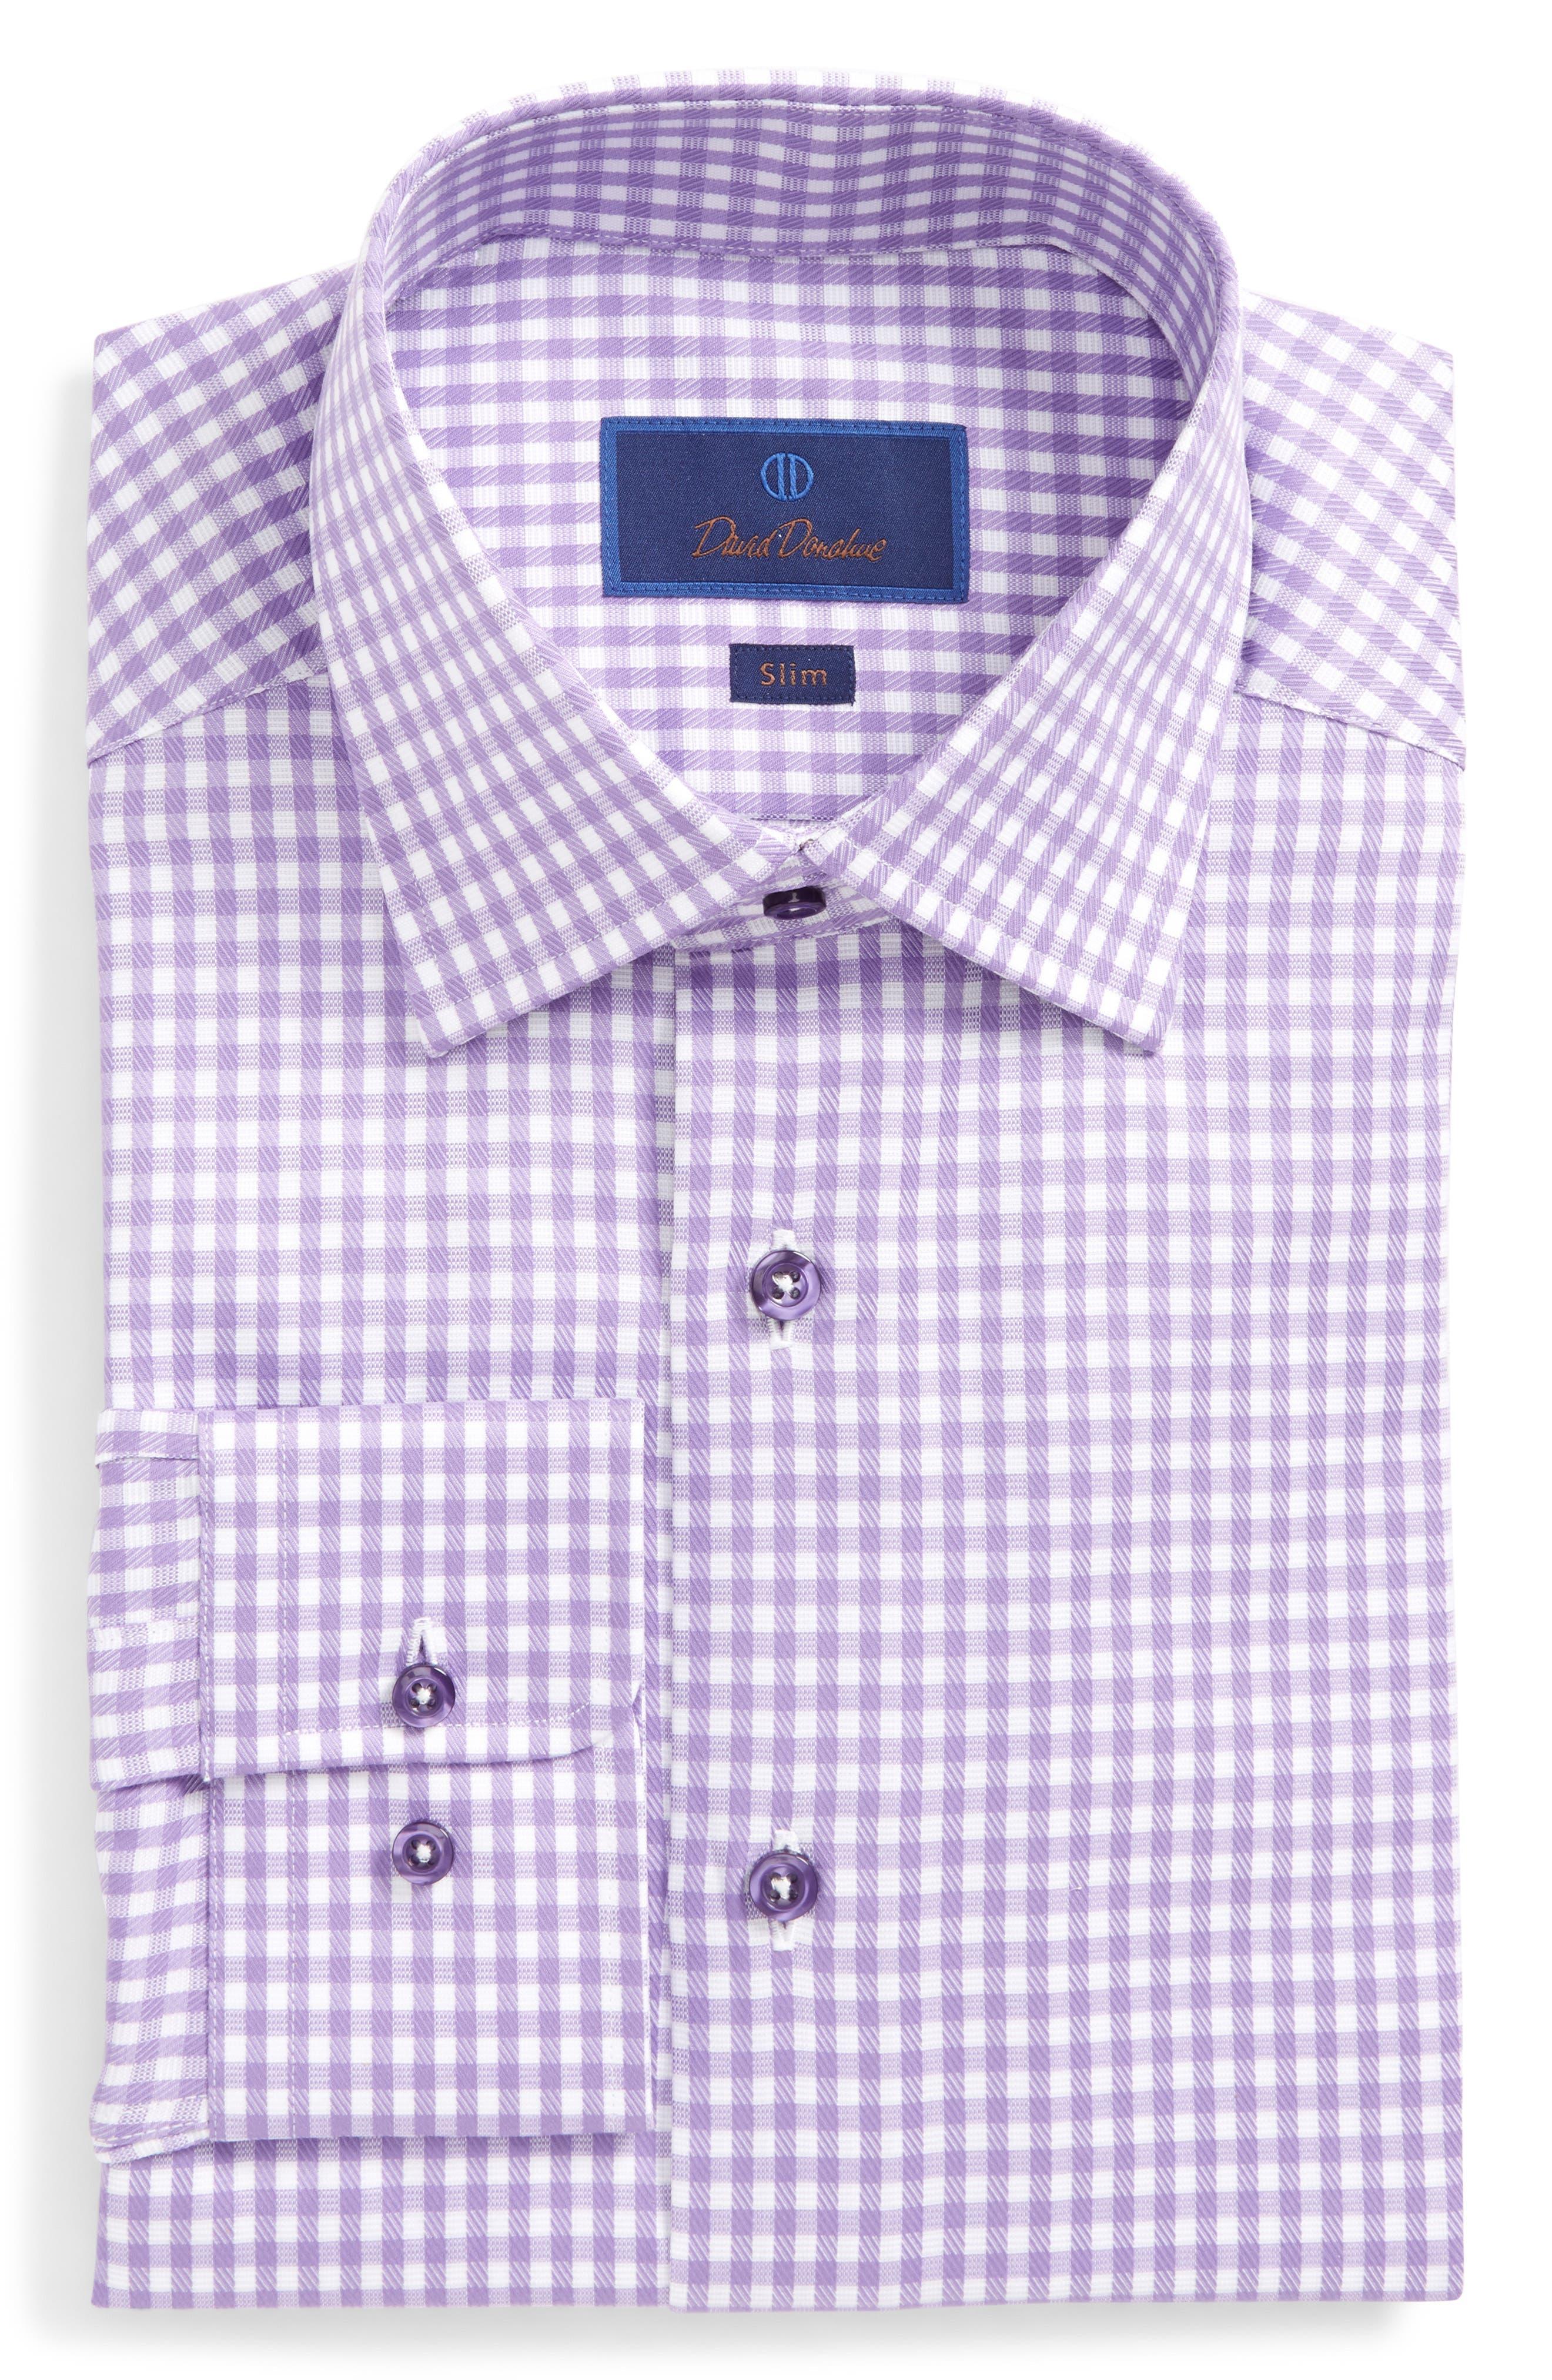 DAVID DONAHUE Slim Fit Check Dress Shirt, Main, color, 534